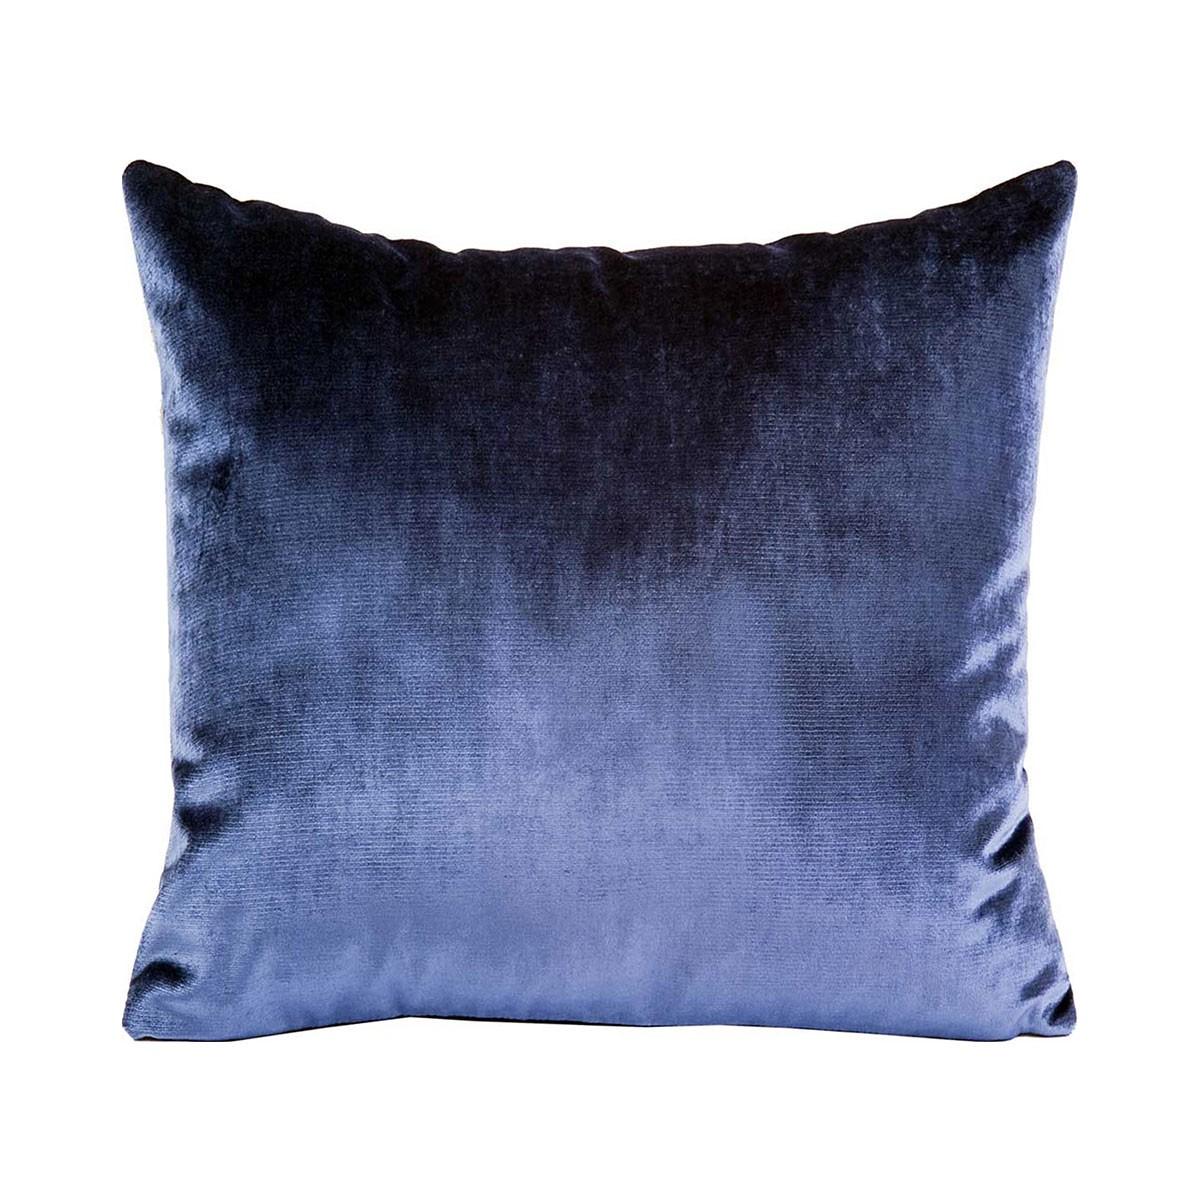 Berlingot Decorative Pillow Square